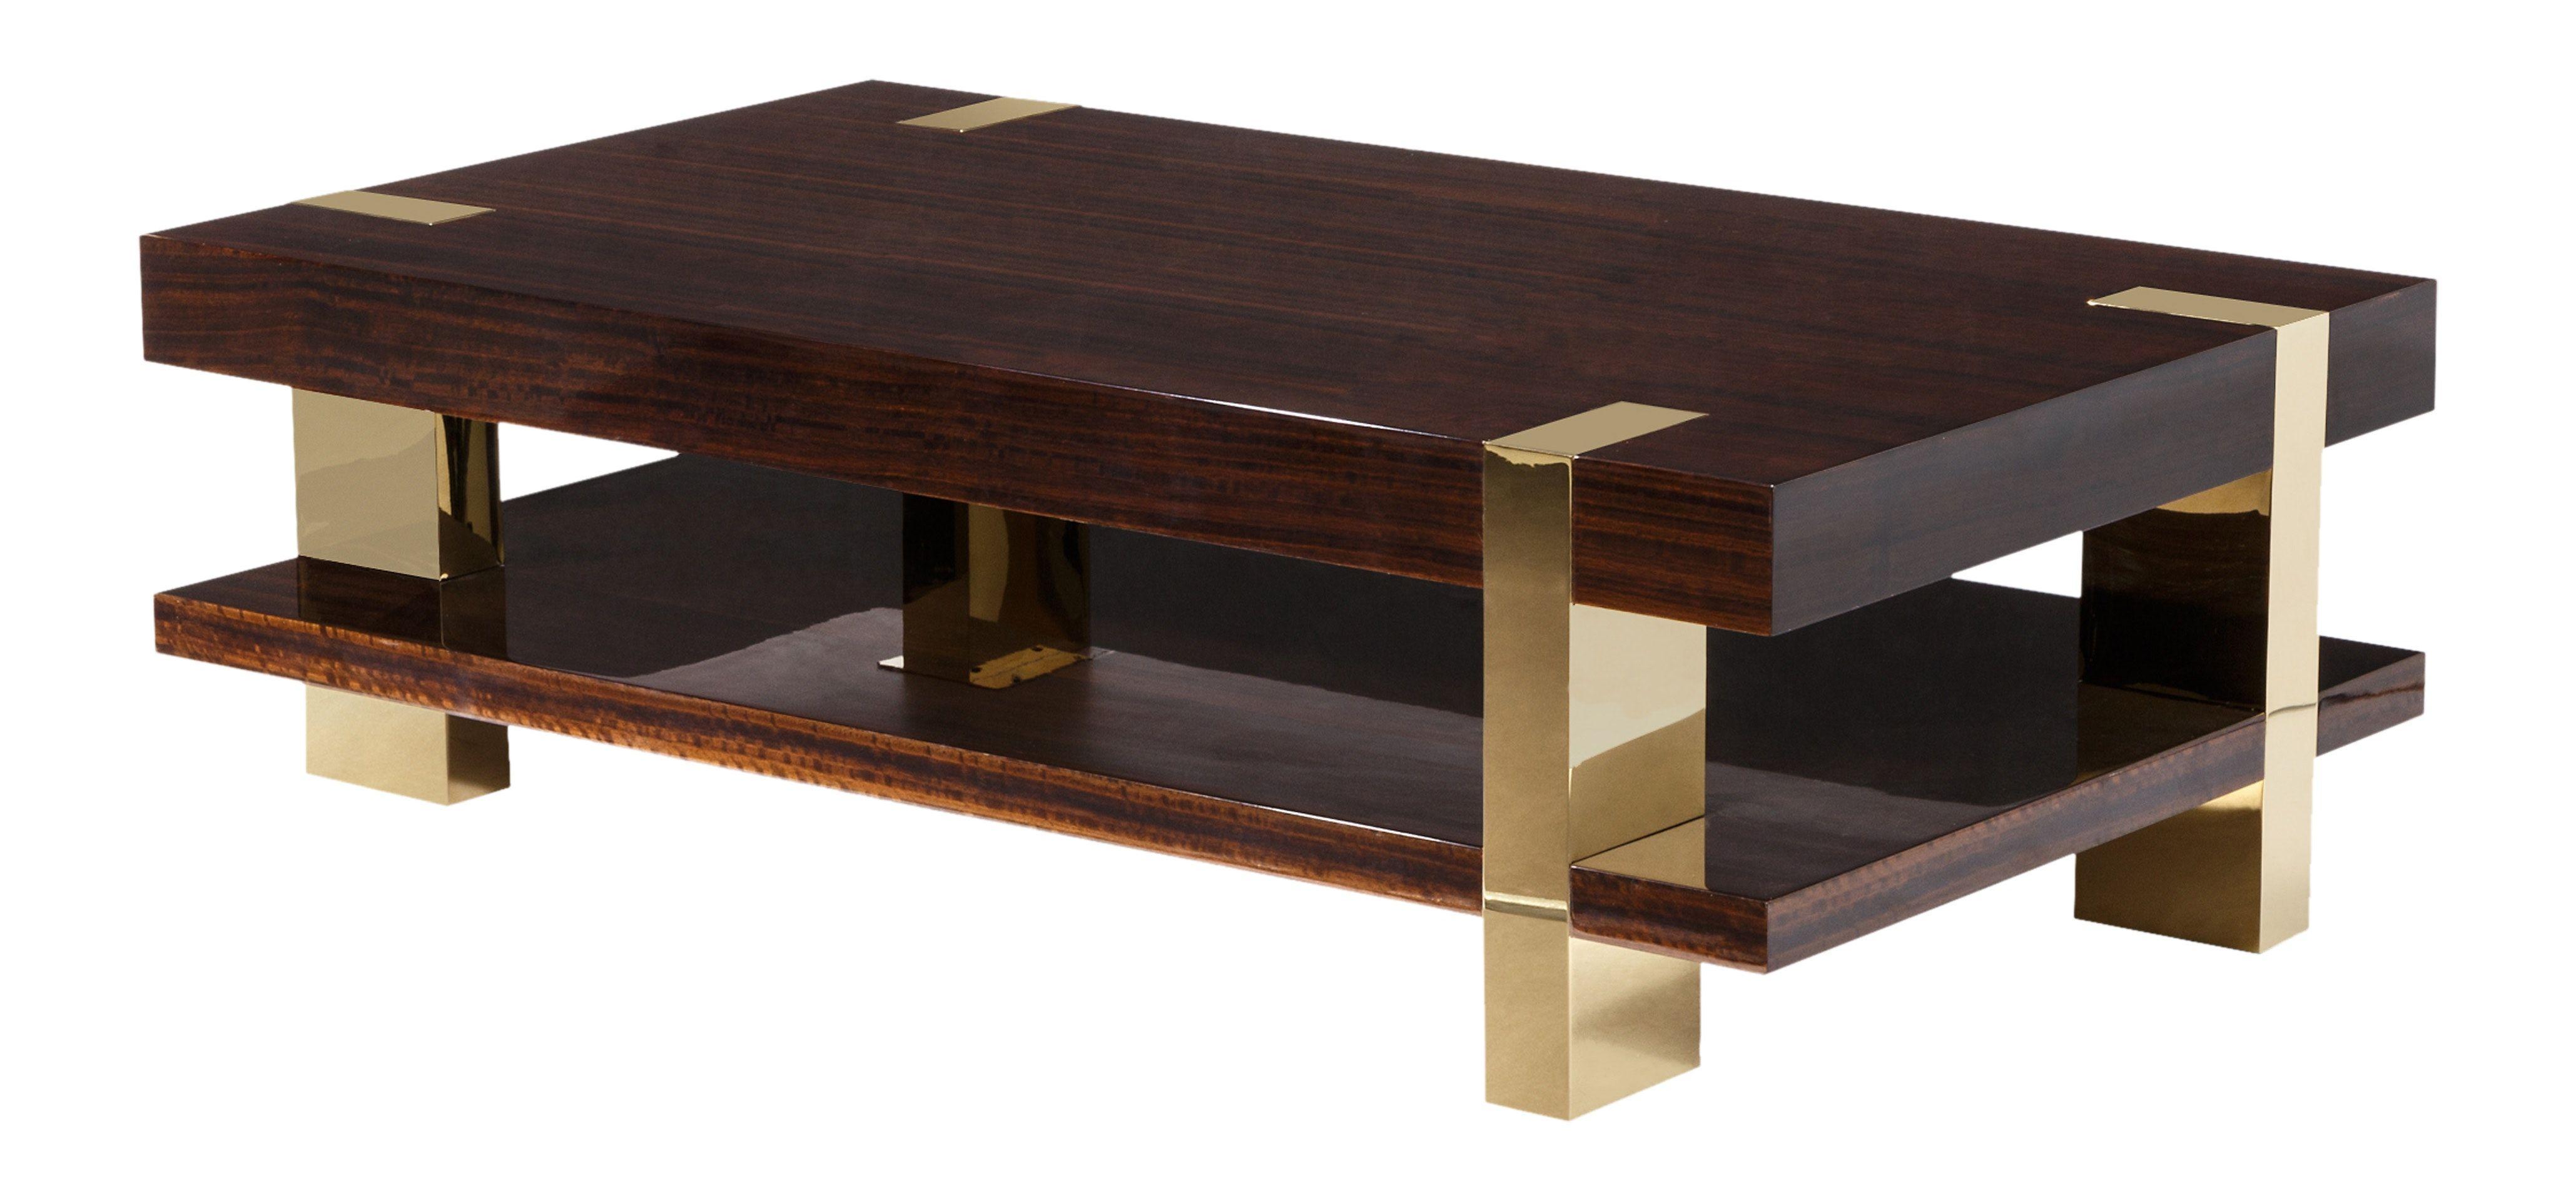 Jordan Cocktail Table Figured Eucalyptus Interlude Home Coffee Table Modern Coffee Tables Table Furniture